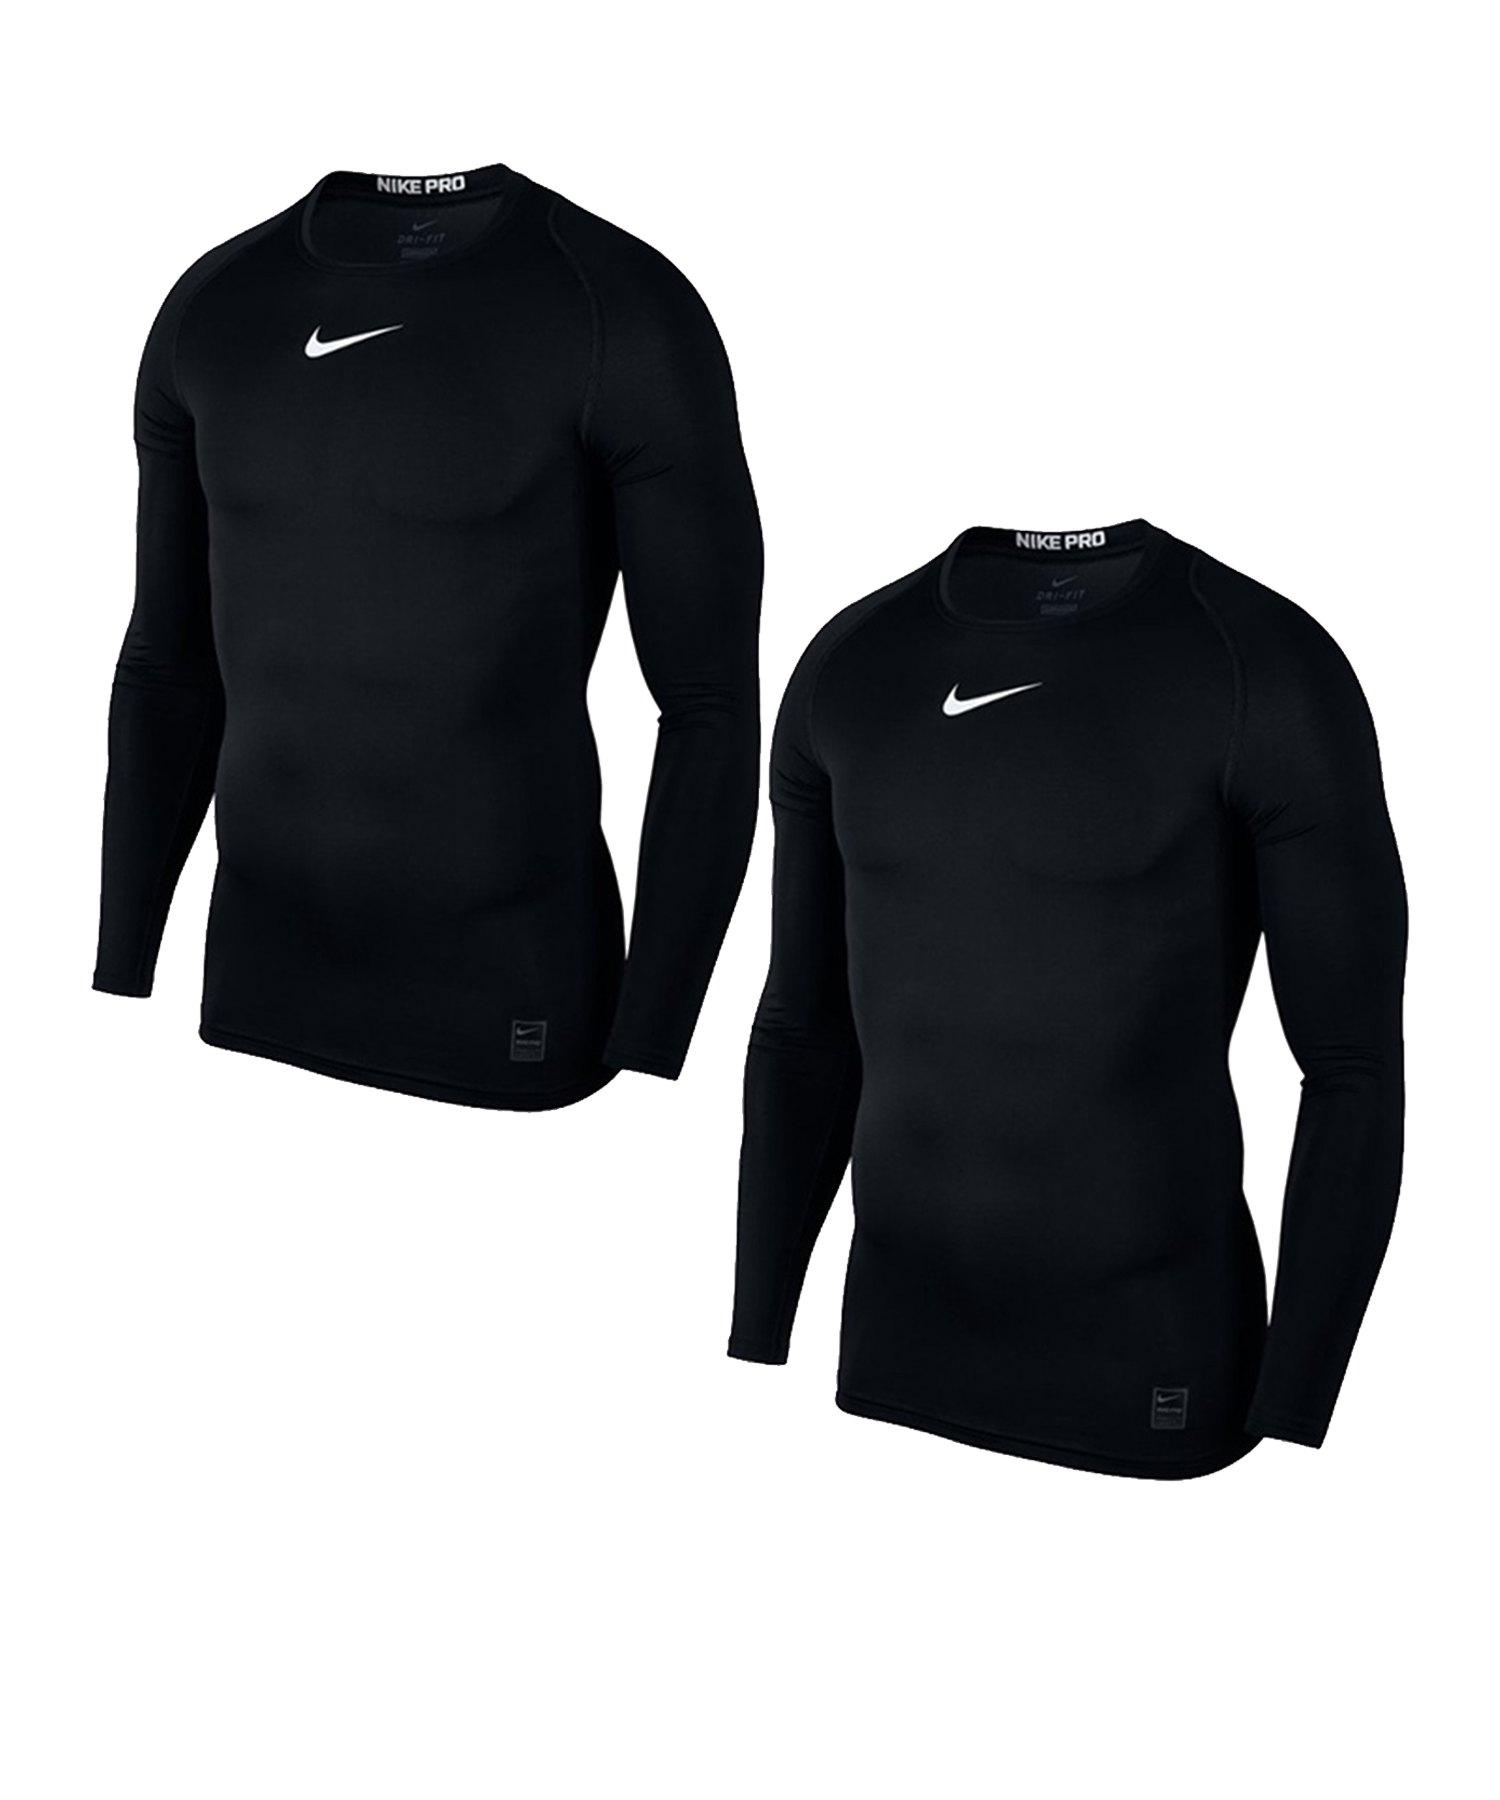 Nike Pro Compression LS Shirt 2er Set Schwarz F010 - schwarz